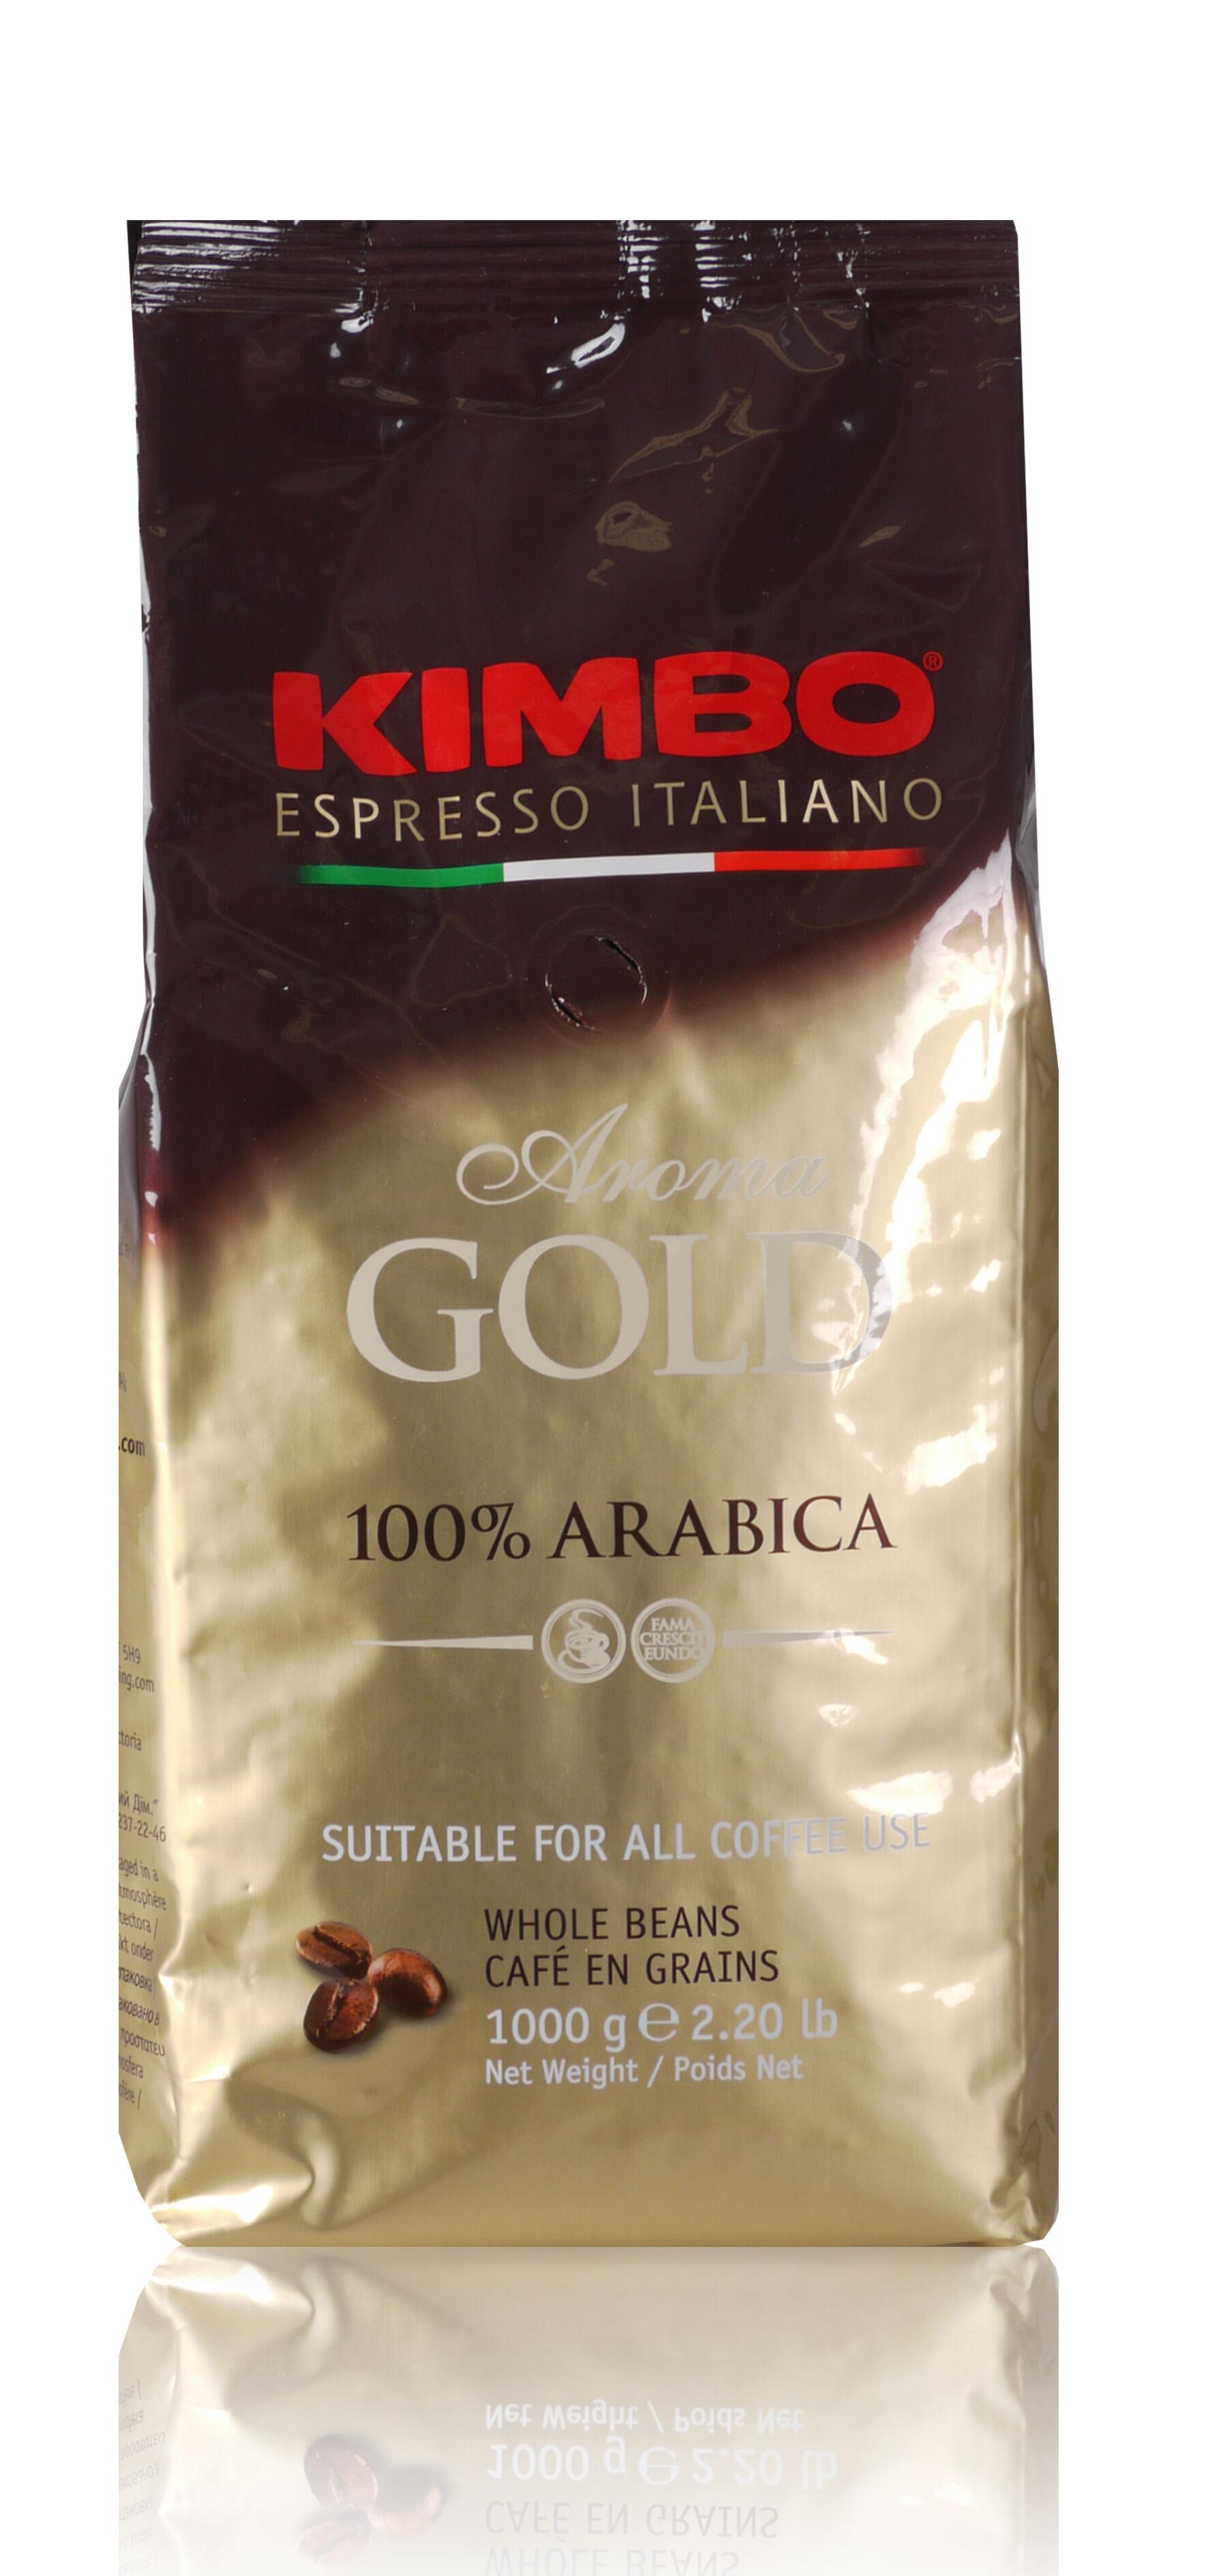 KIMBO Aroma Gold 100% Arabica 6 X 1 KG Bohnen im Beutel